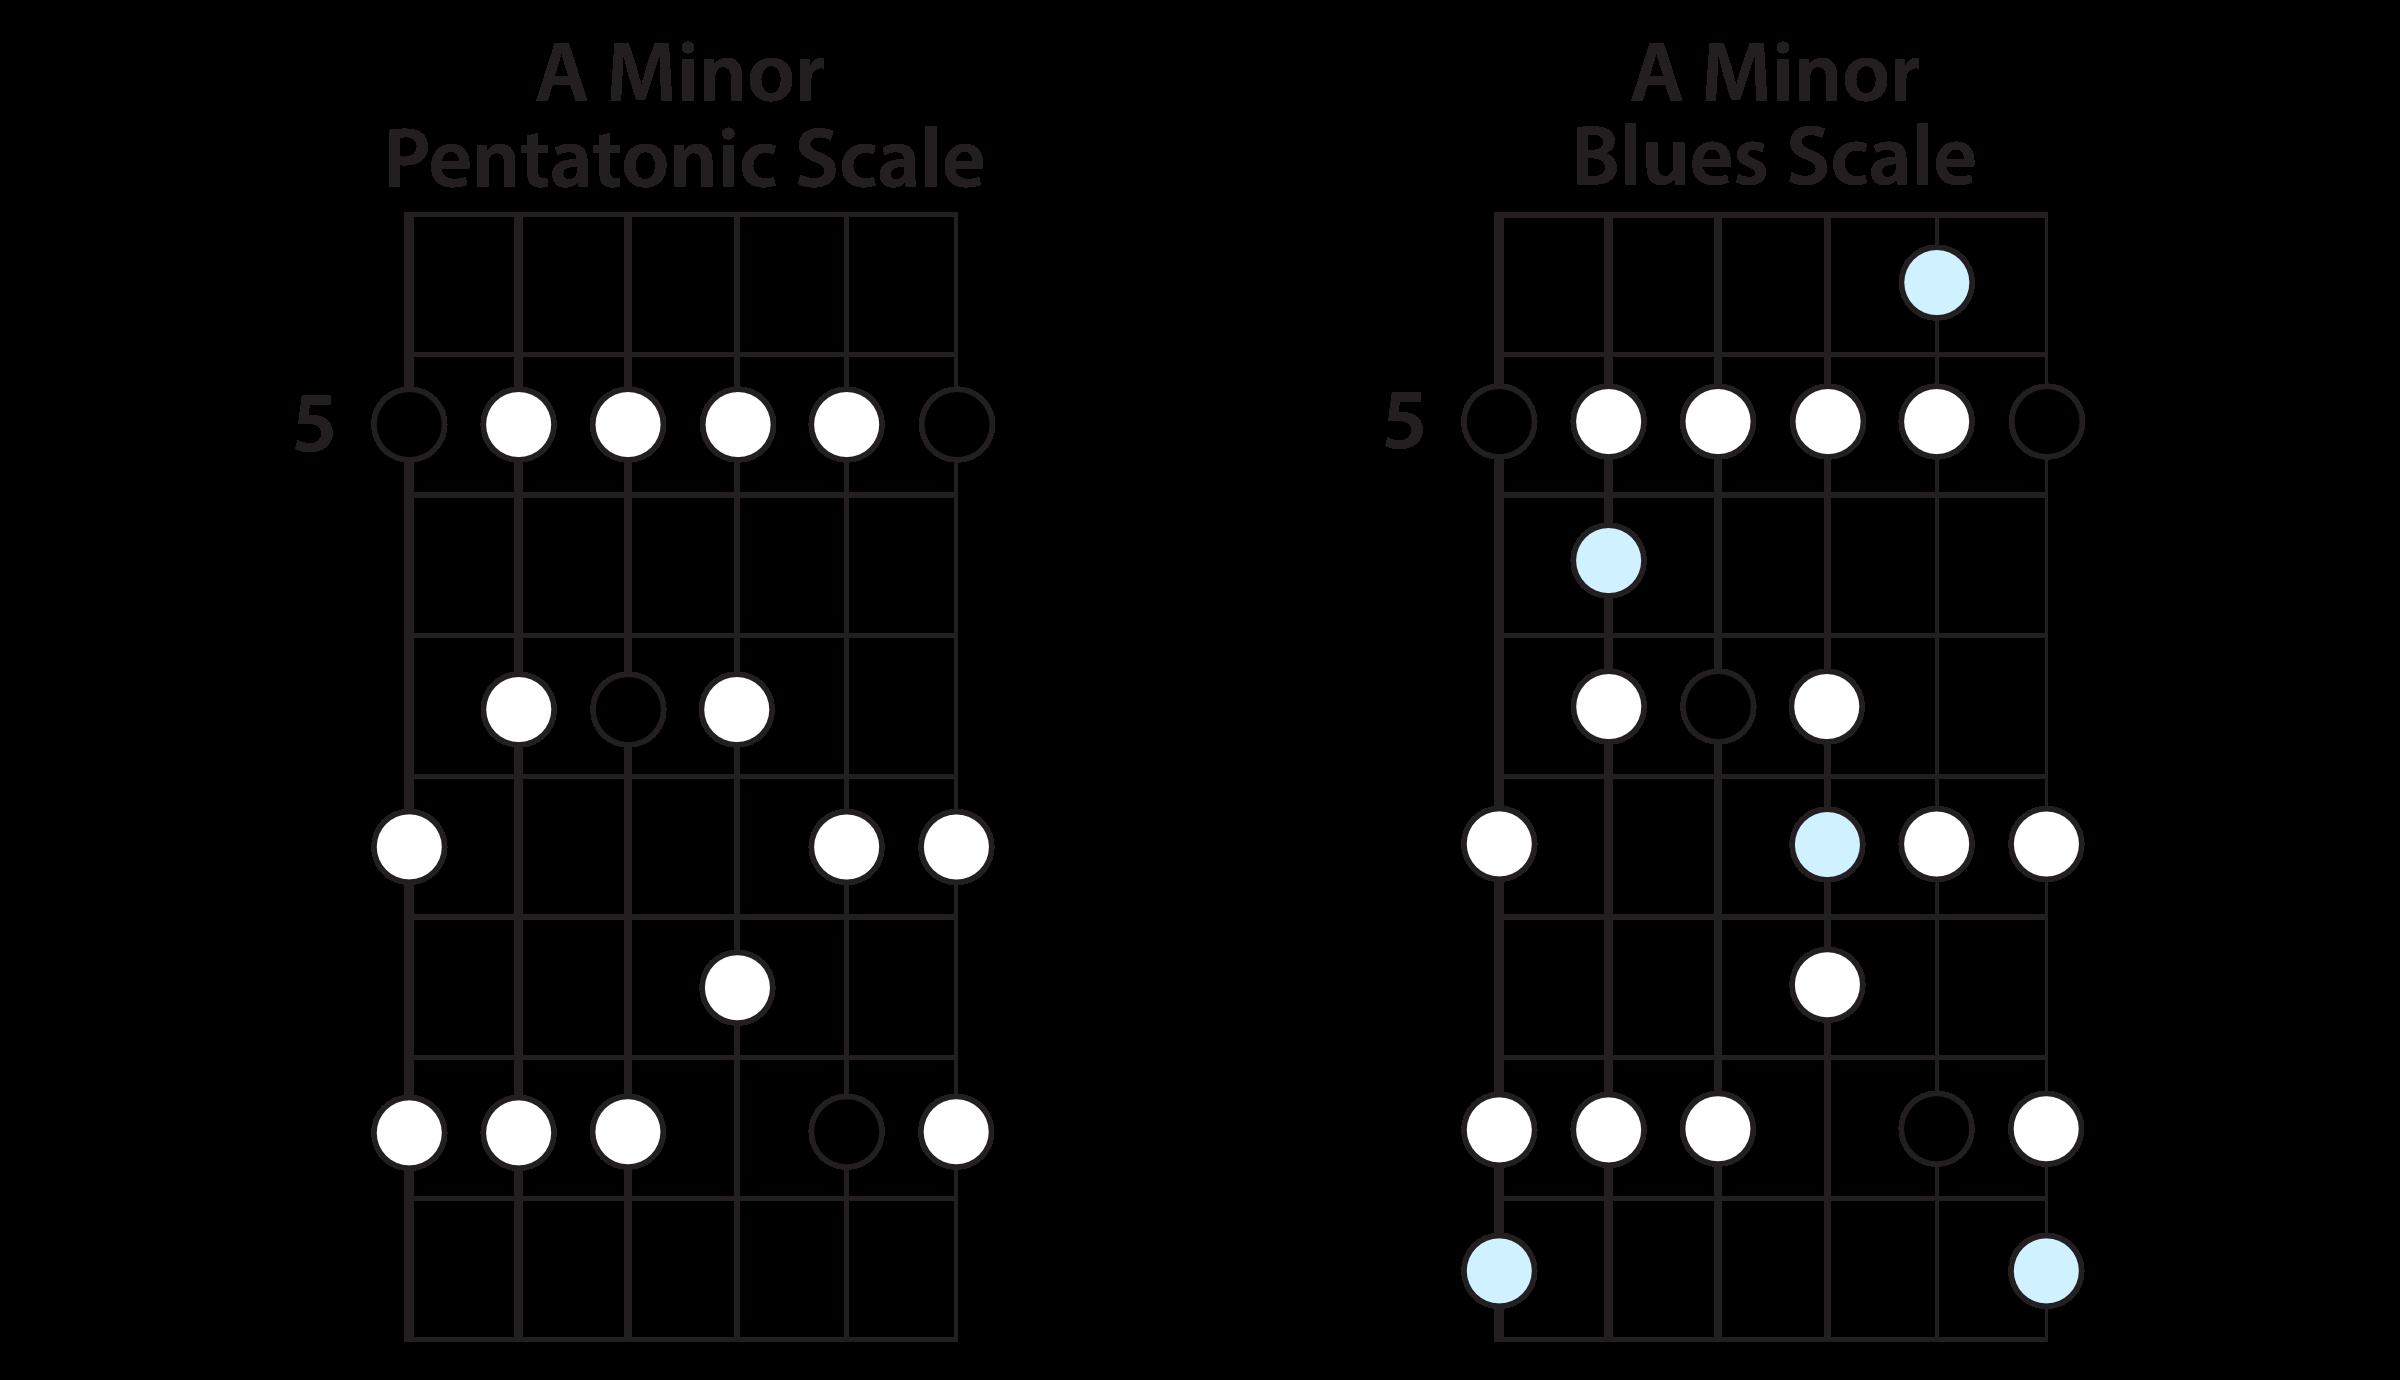 A Minor Pentatonic & A Minor Blues Scales